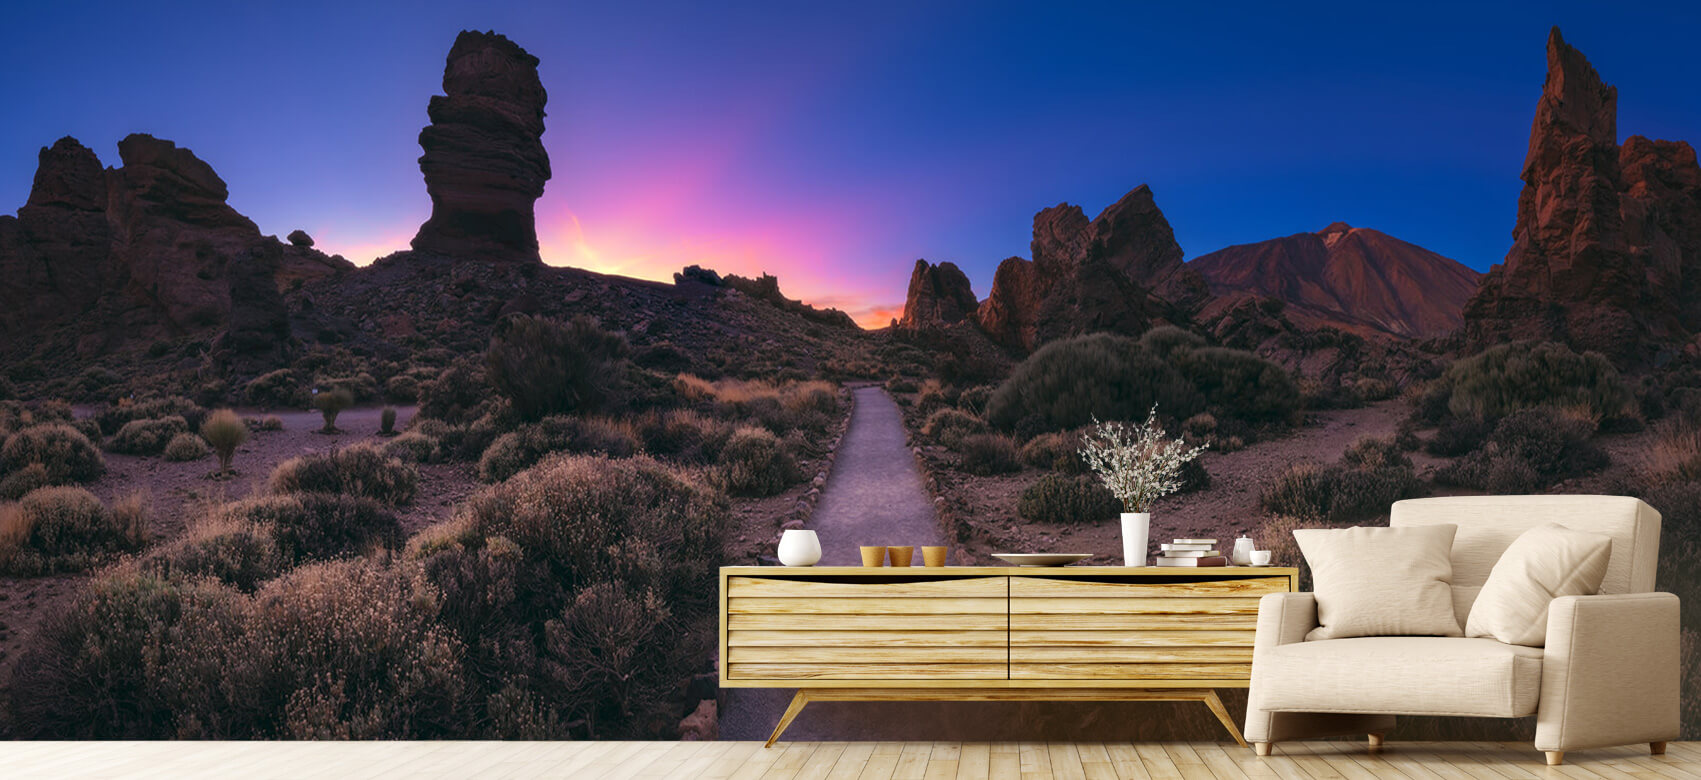 Landscape Tenerife - Canadas del Teide Panorama 4